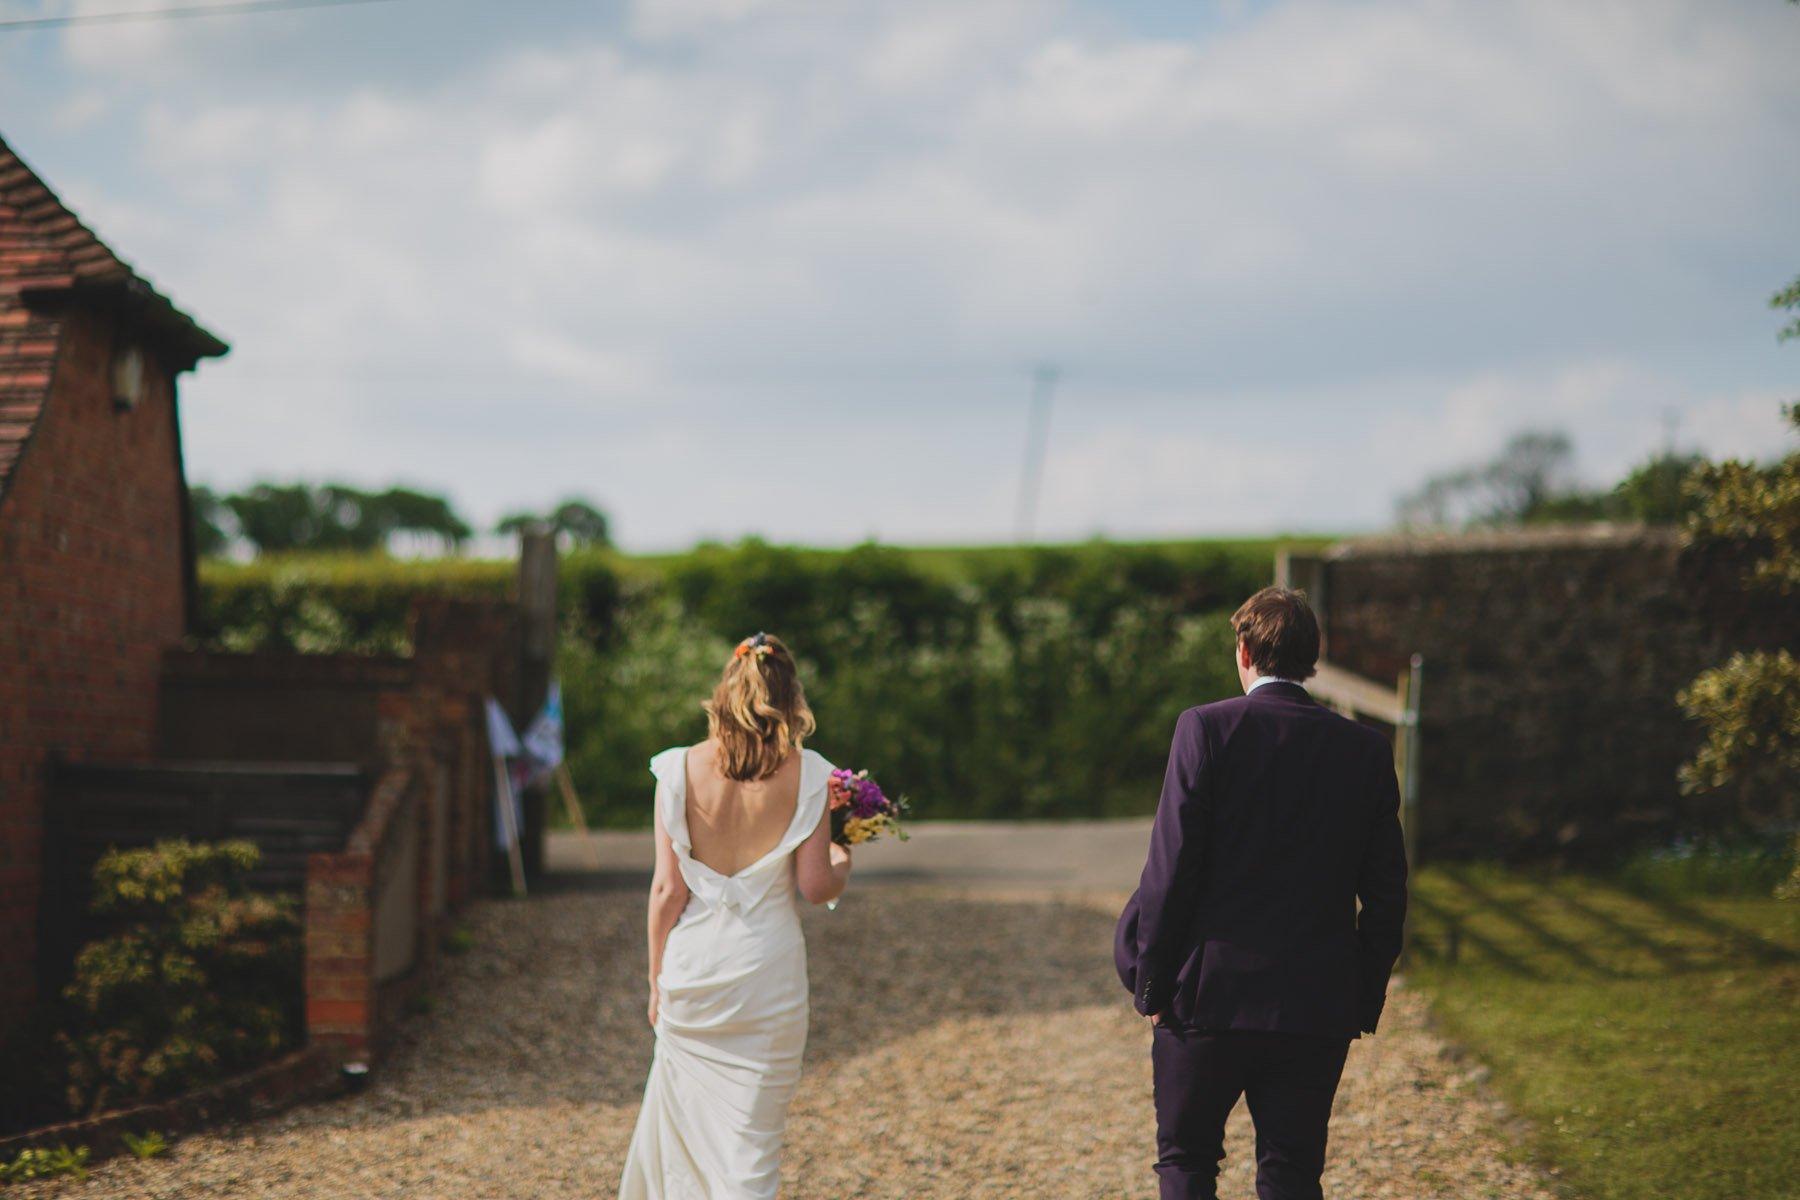 Buckinghamshire-Wedding-Lizzie-Duncan-104